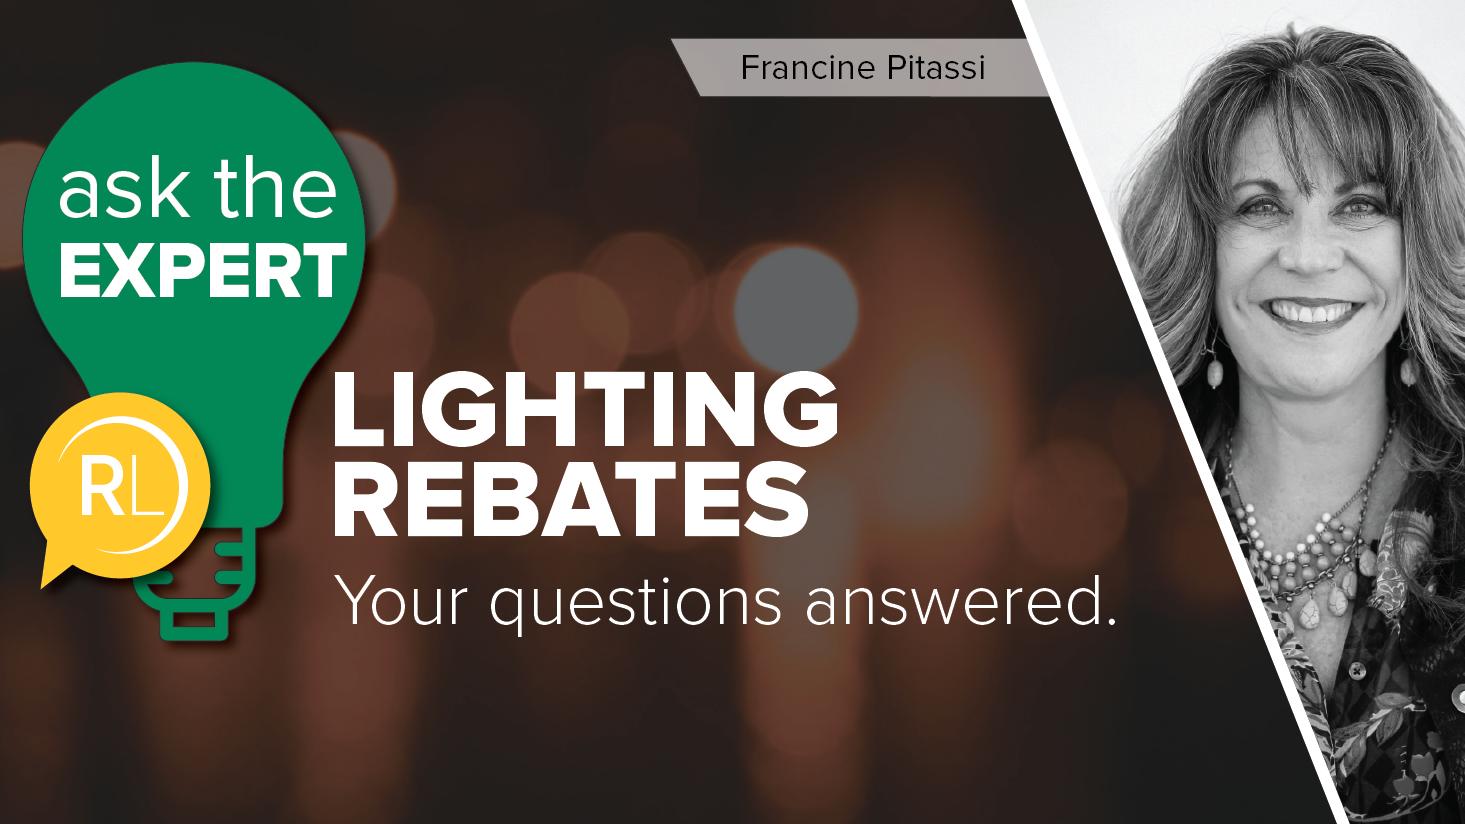 Ask-the-Expert-Series-LightingRebates-BlogHeader-FrancinePitassi